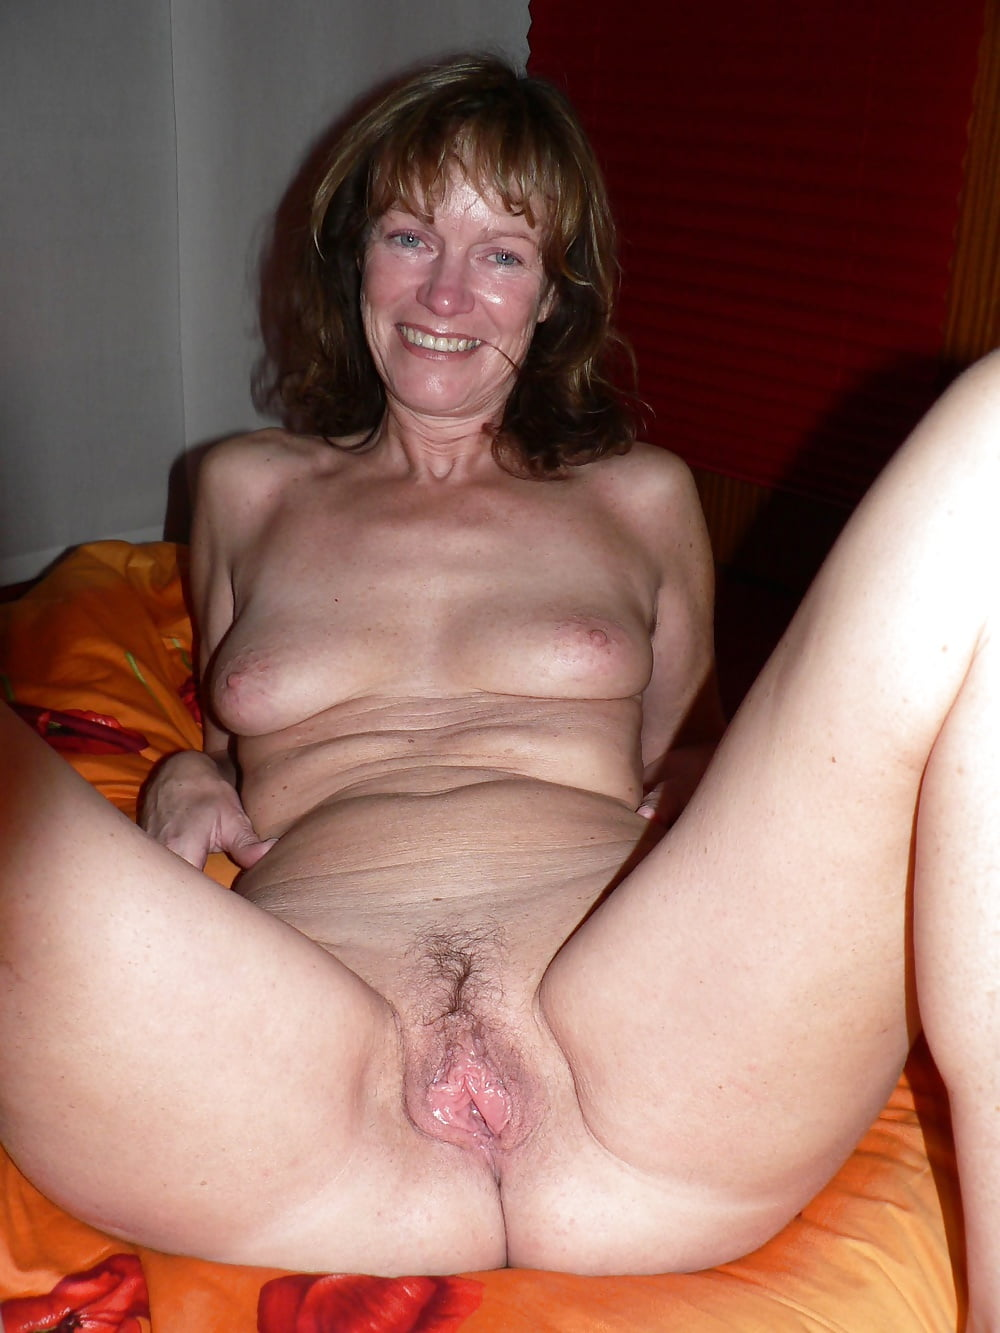 Posing Nude For My Husband - 11 Pics - Xhamstercom-5146